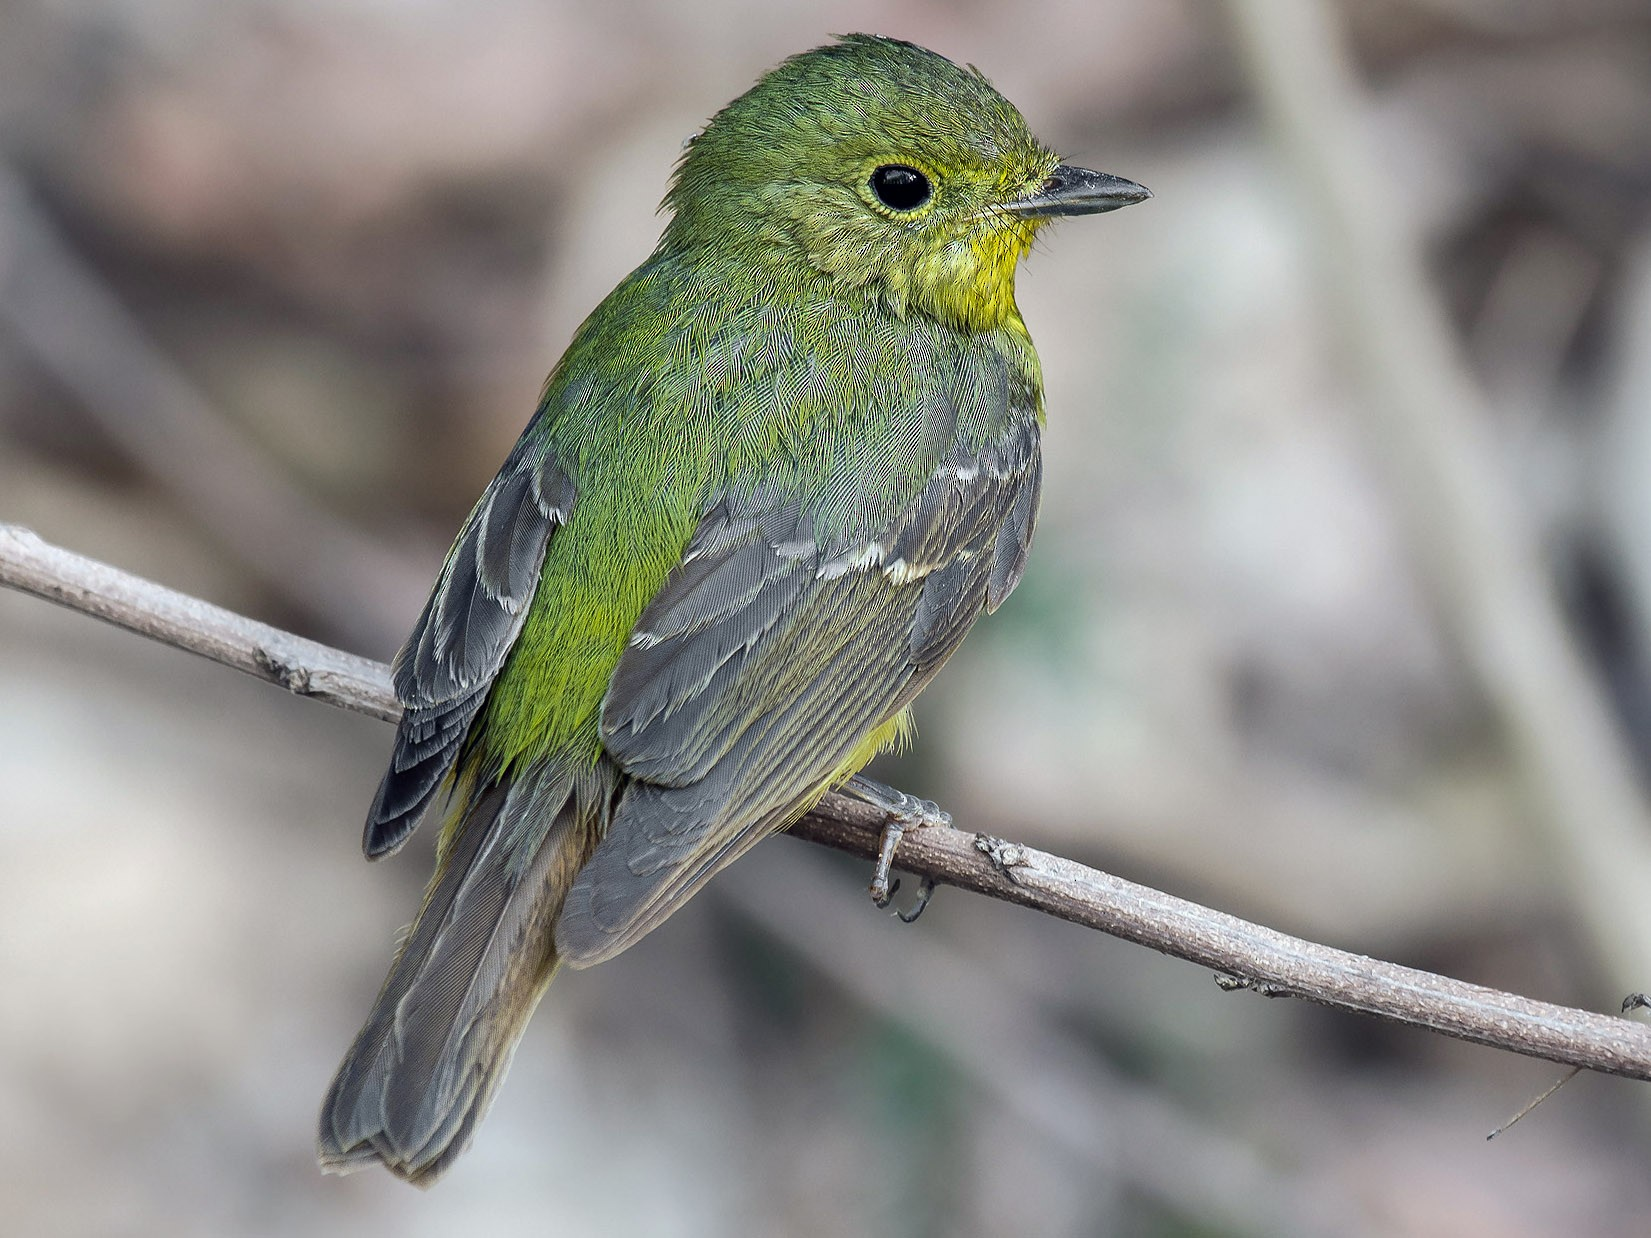 Green-backed Flycatcher - Natthaphat Chotjuckdikul